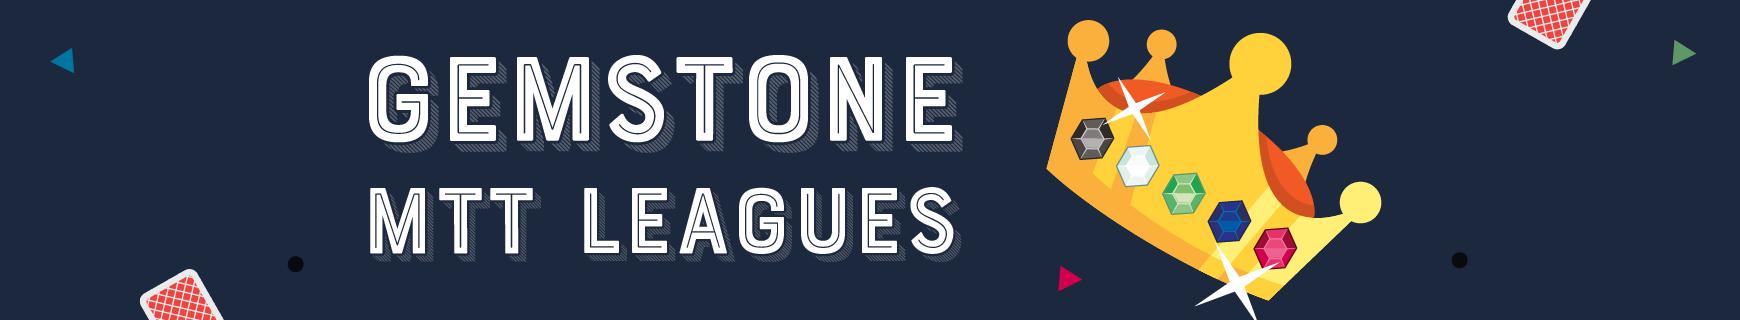 Gemstone mtt leagues %28870 x 160%29 2x